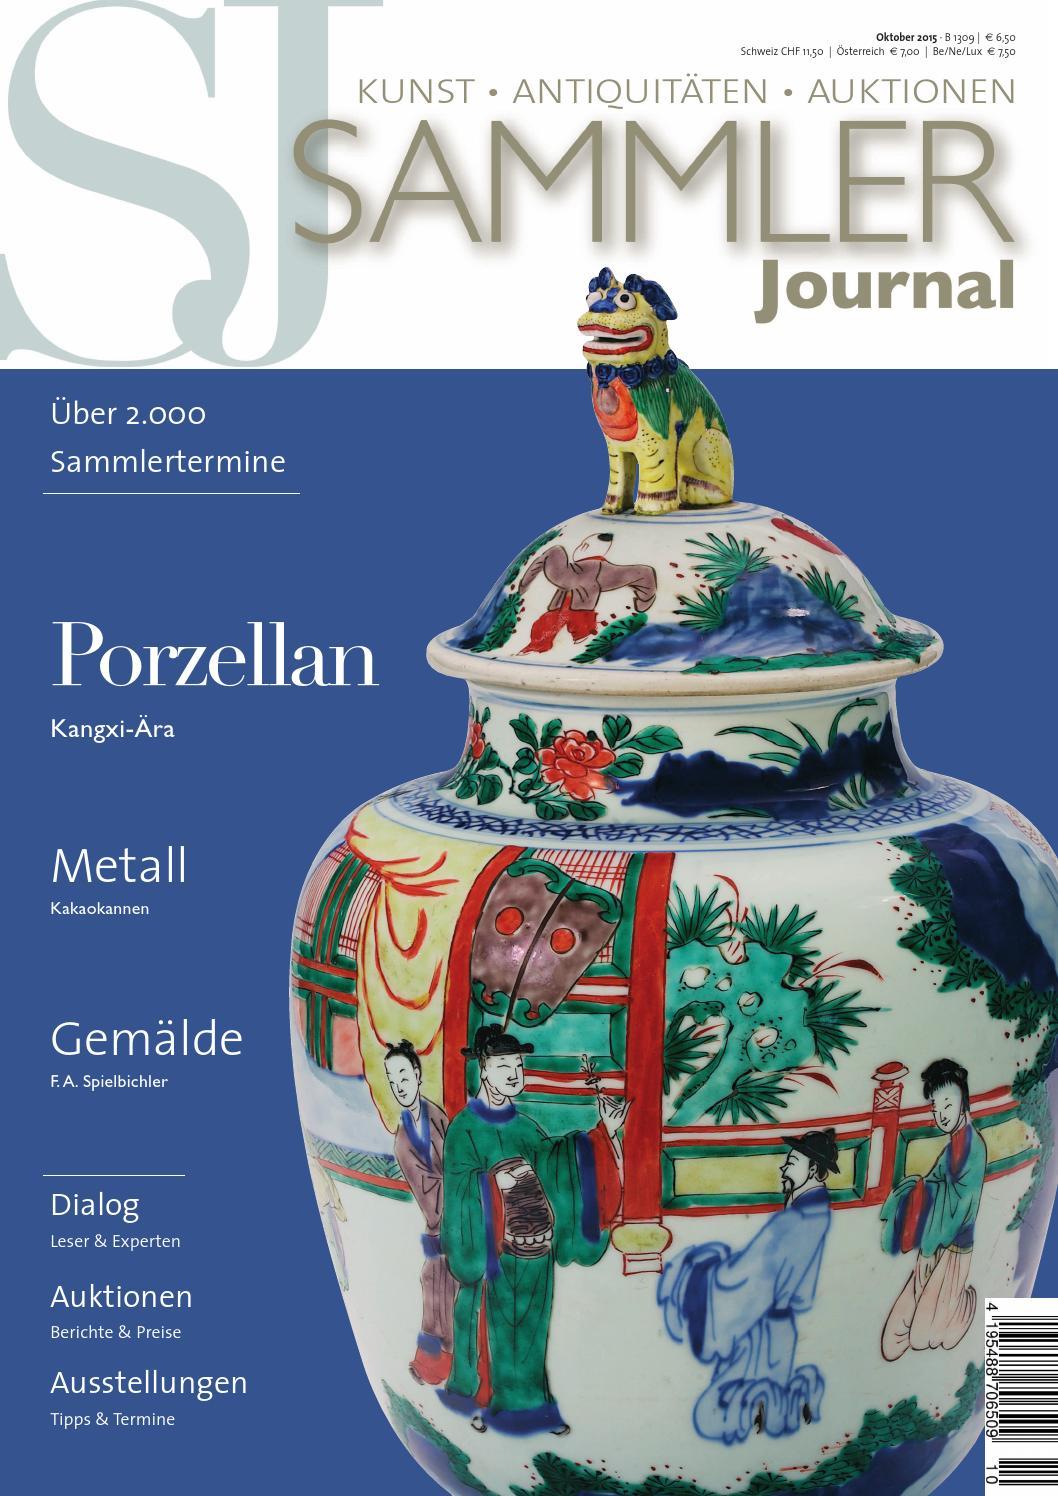 Sammler journal 1015 by Gemi Verlags GmbH - issuu